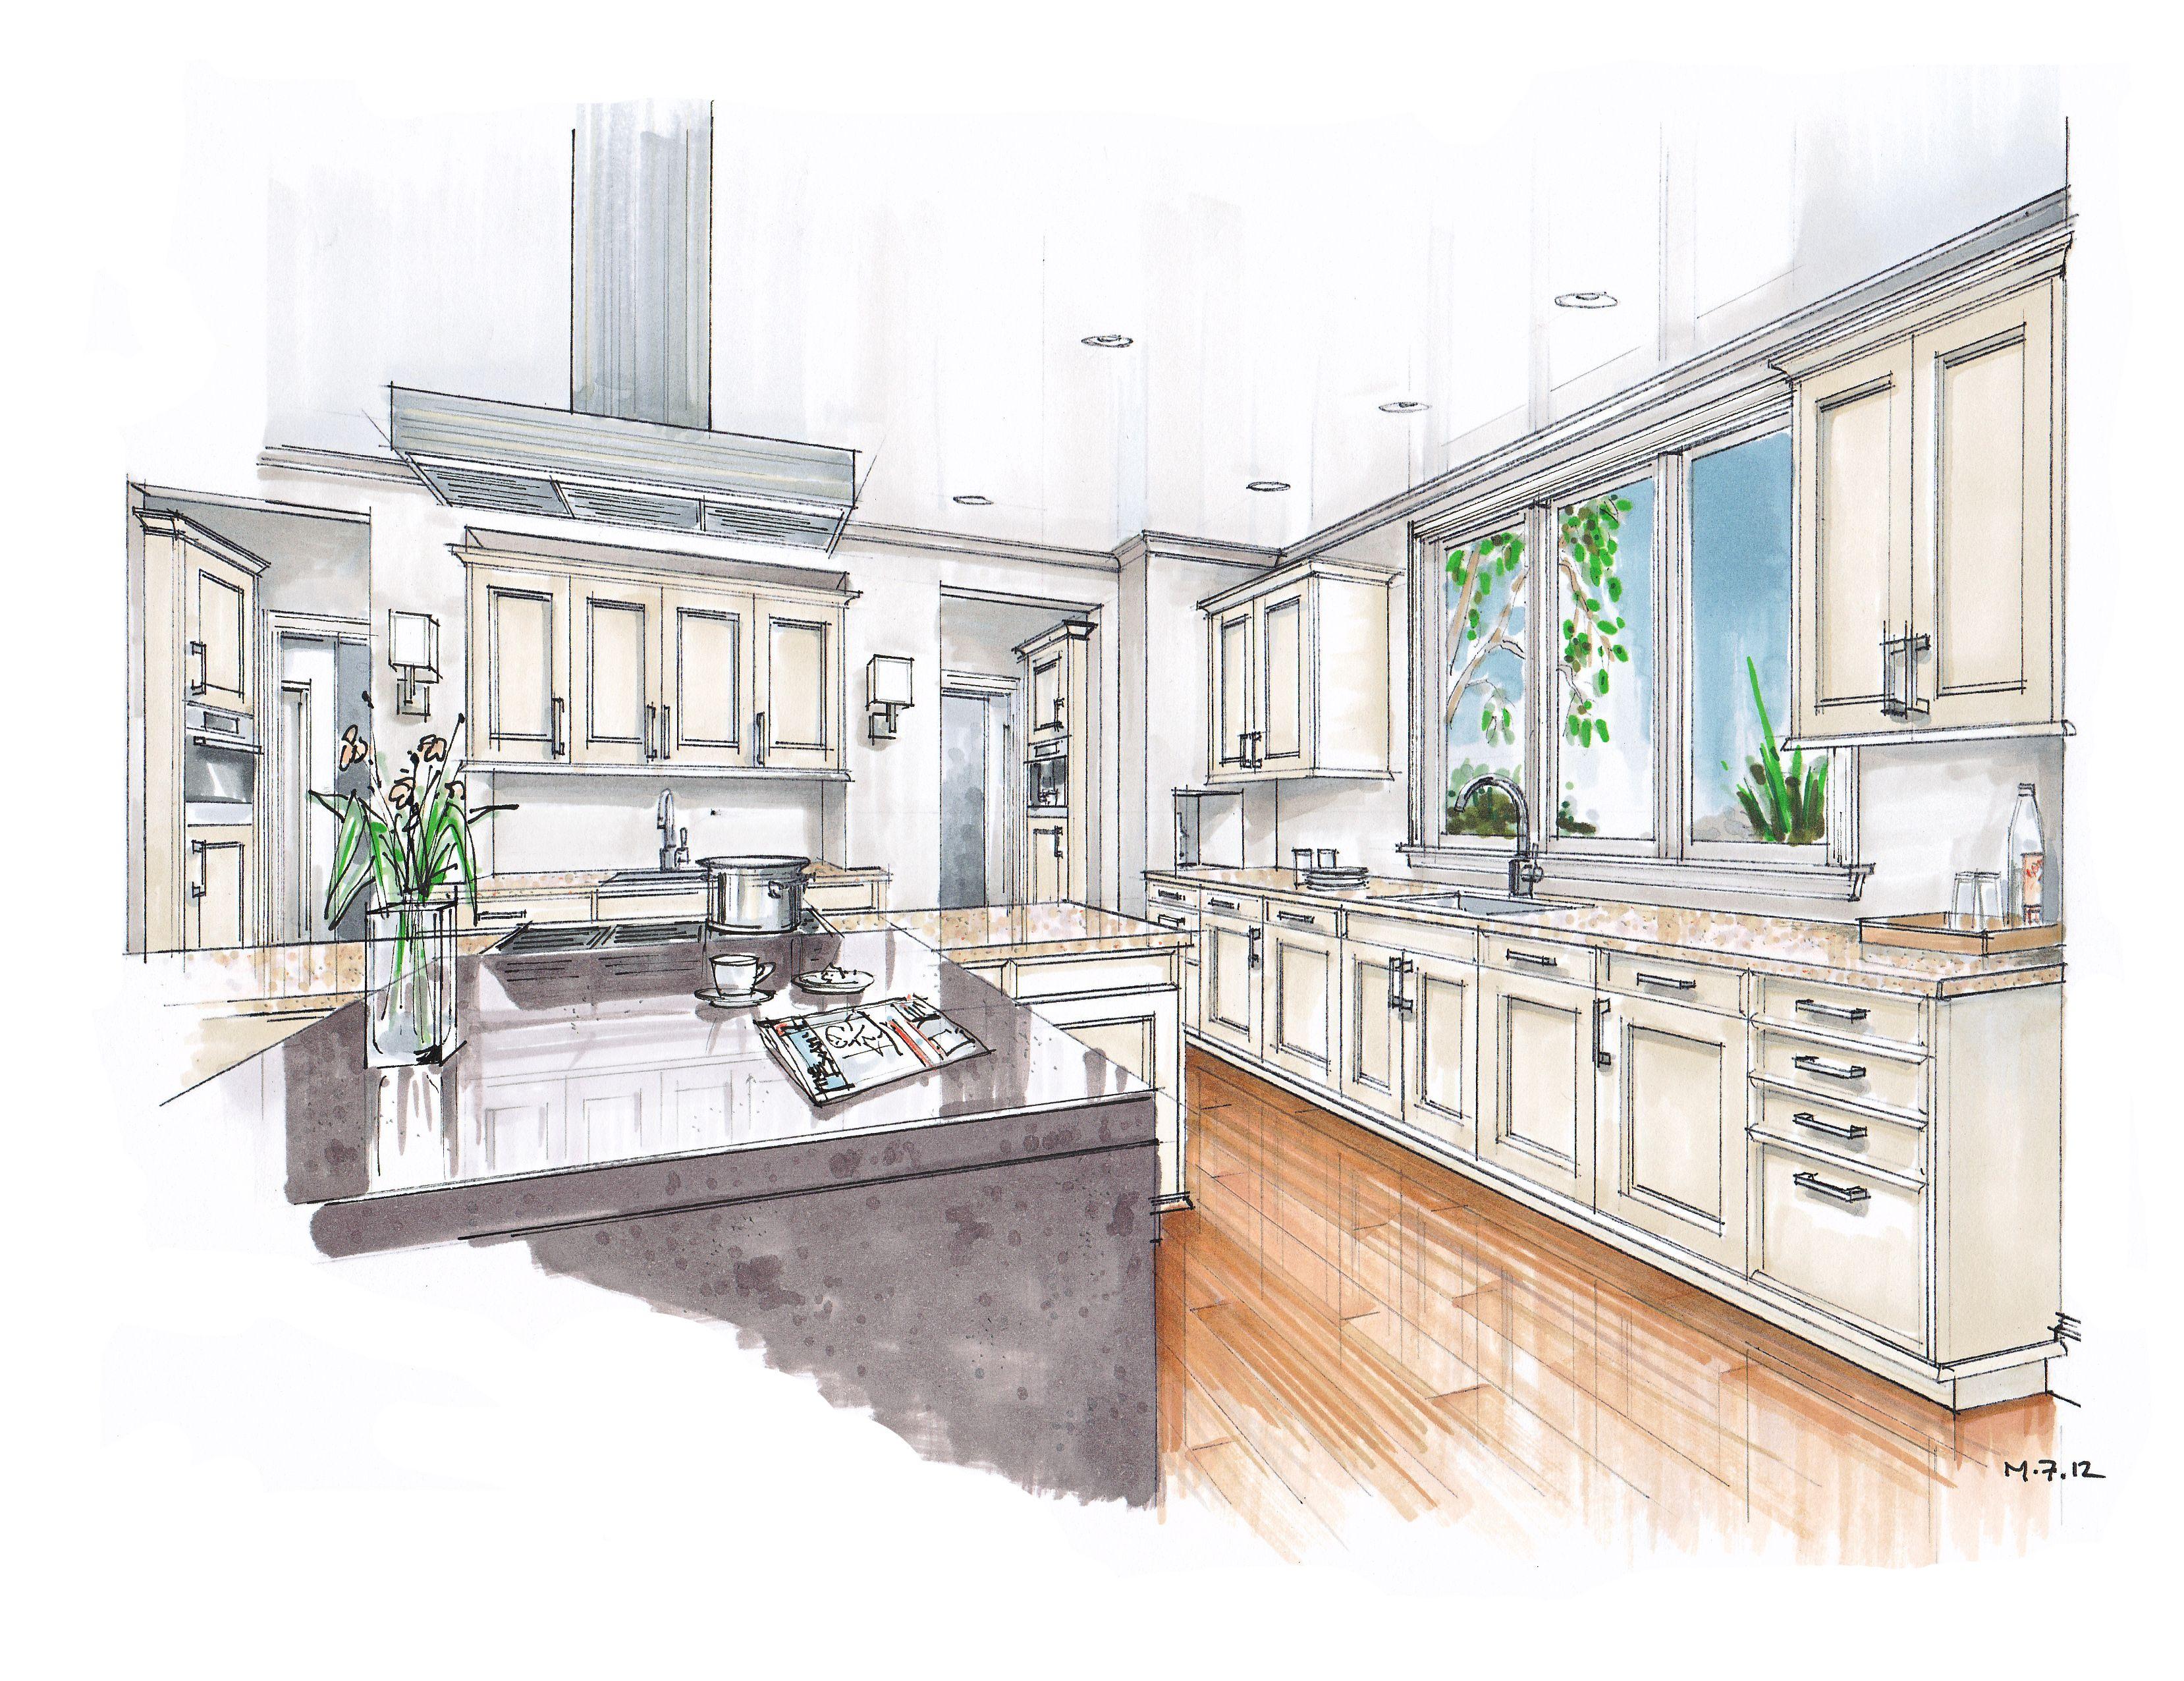 Best Sketches Interior Images On Pinterest Interior Design